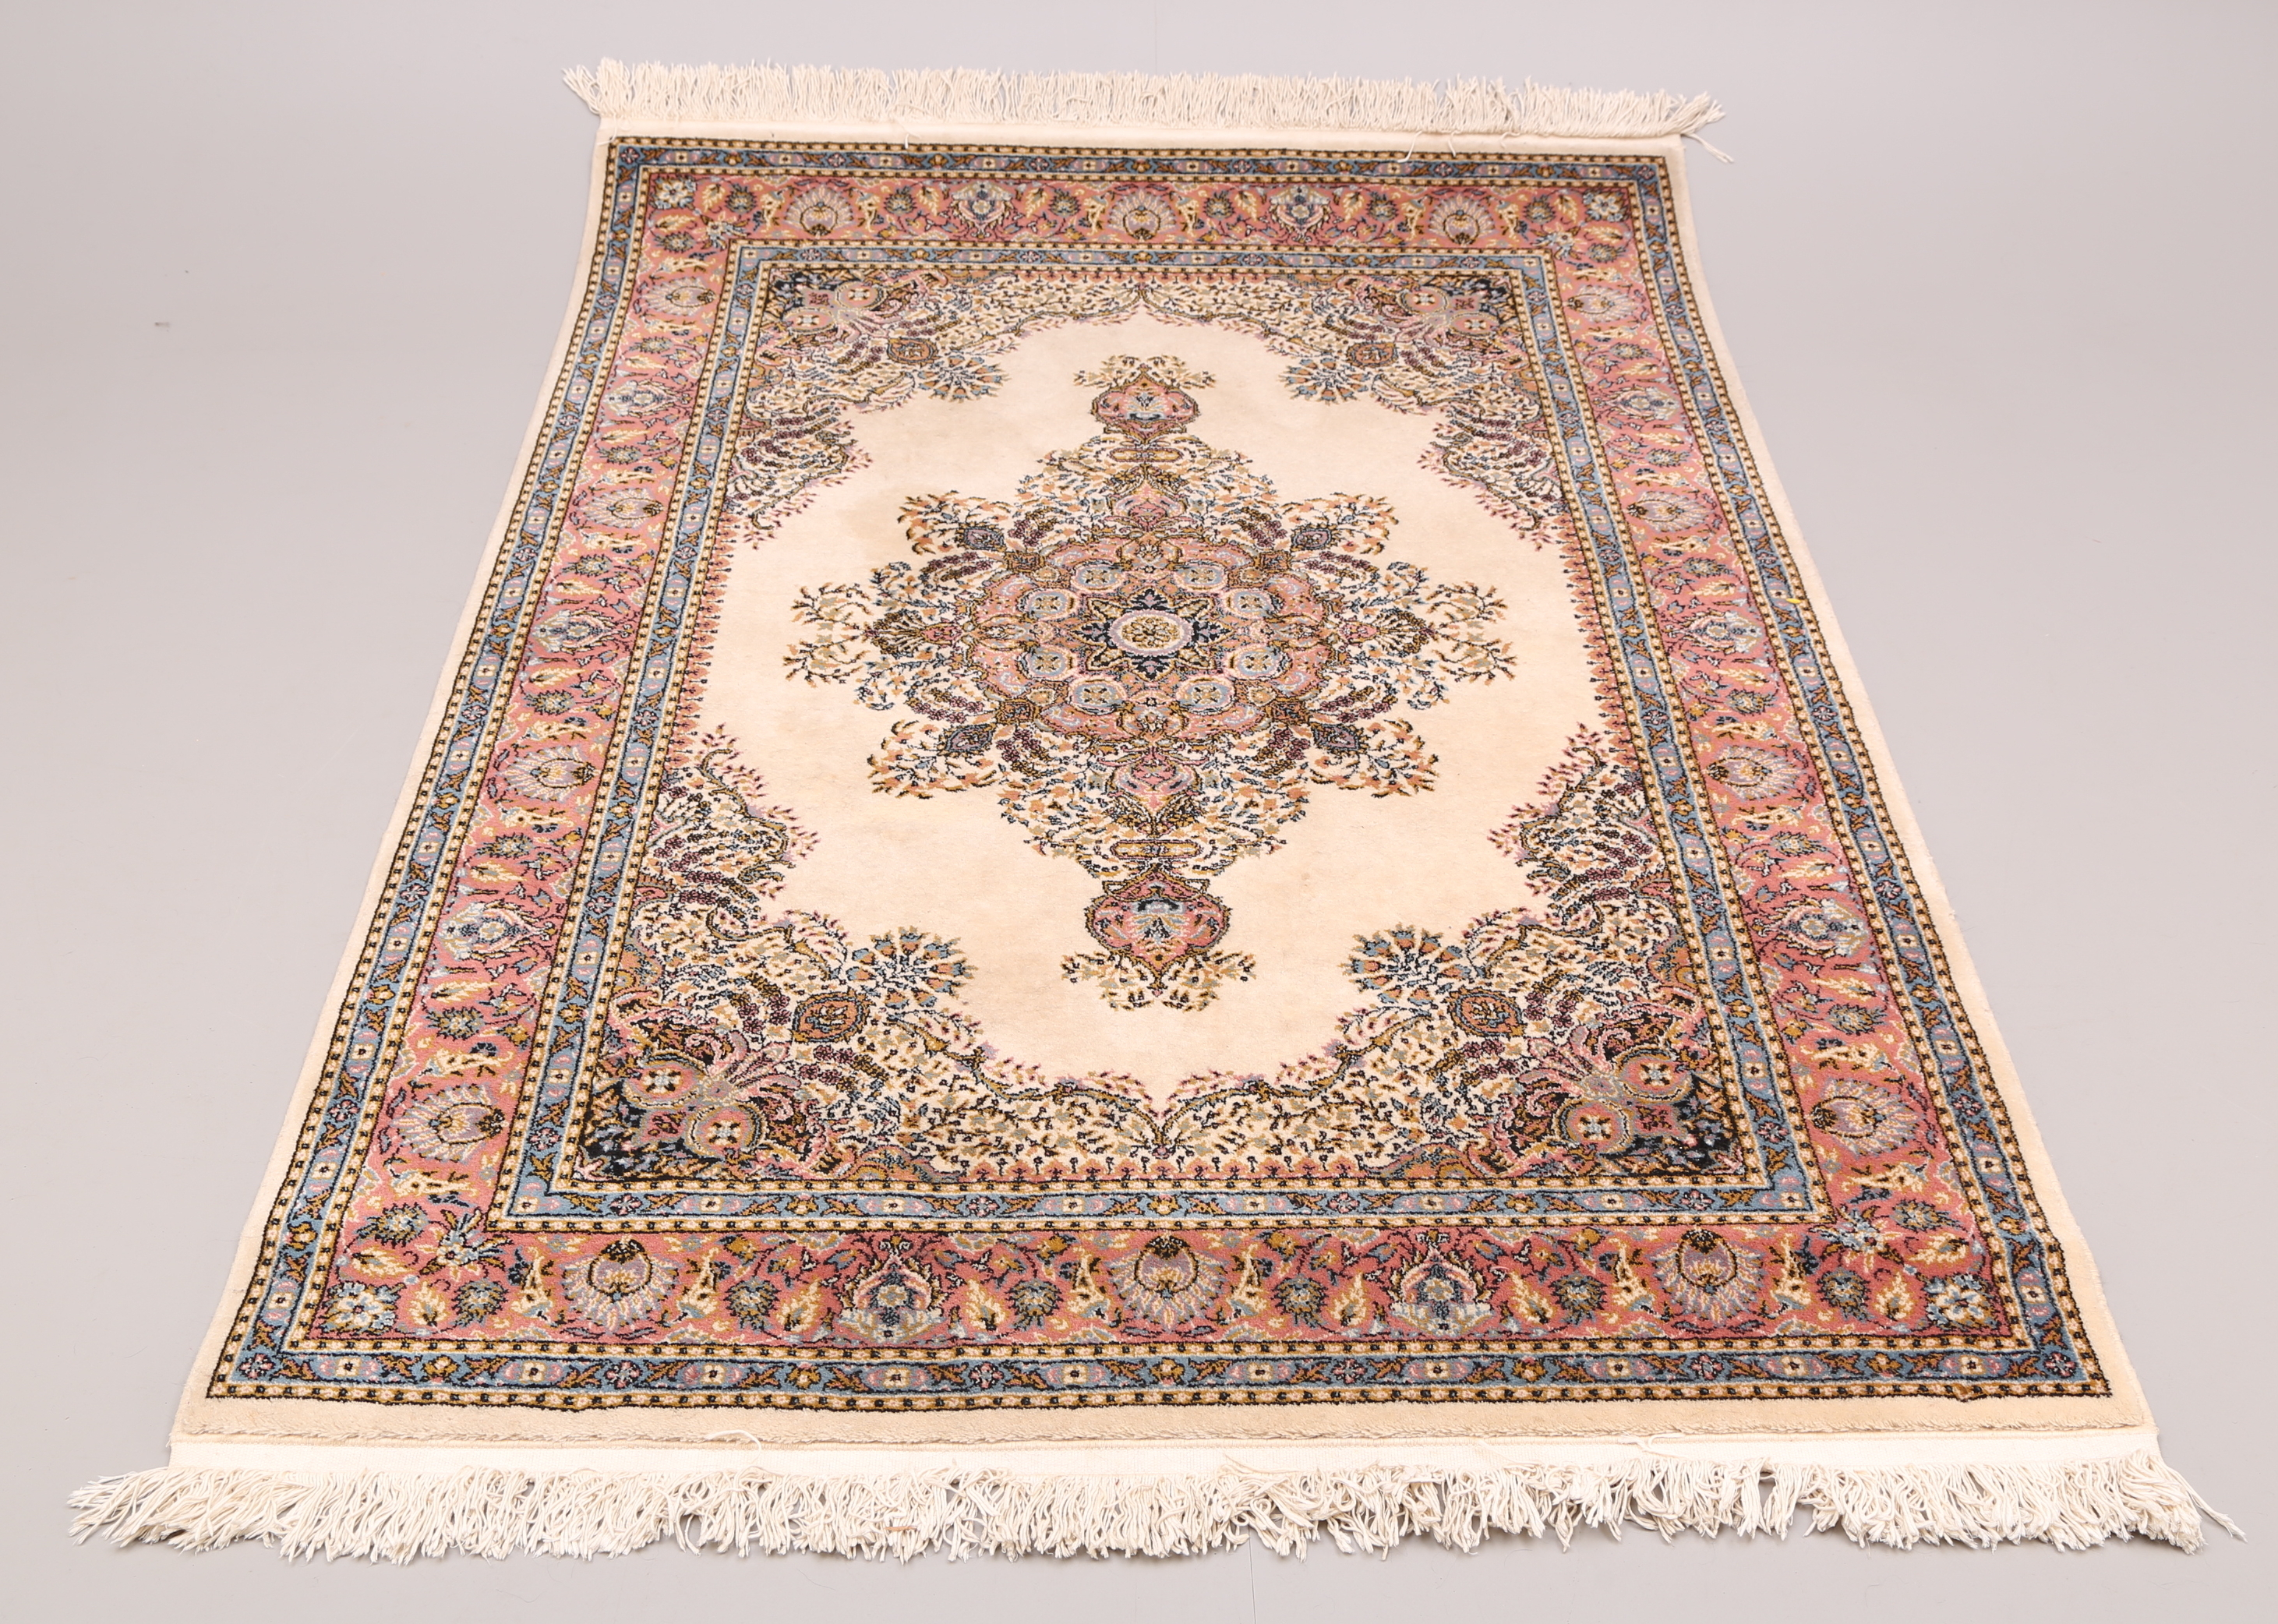 Atlas Halilari Carpets Carpet Vidalondon